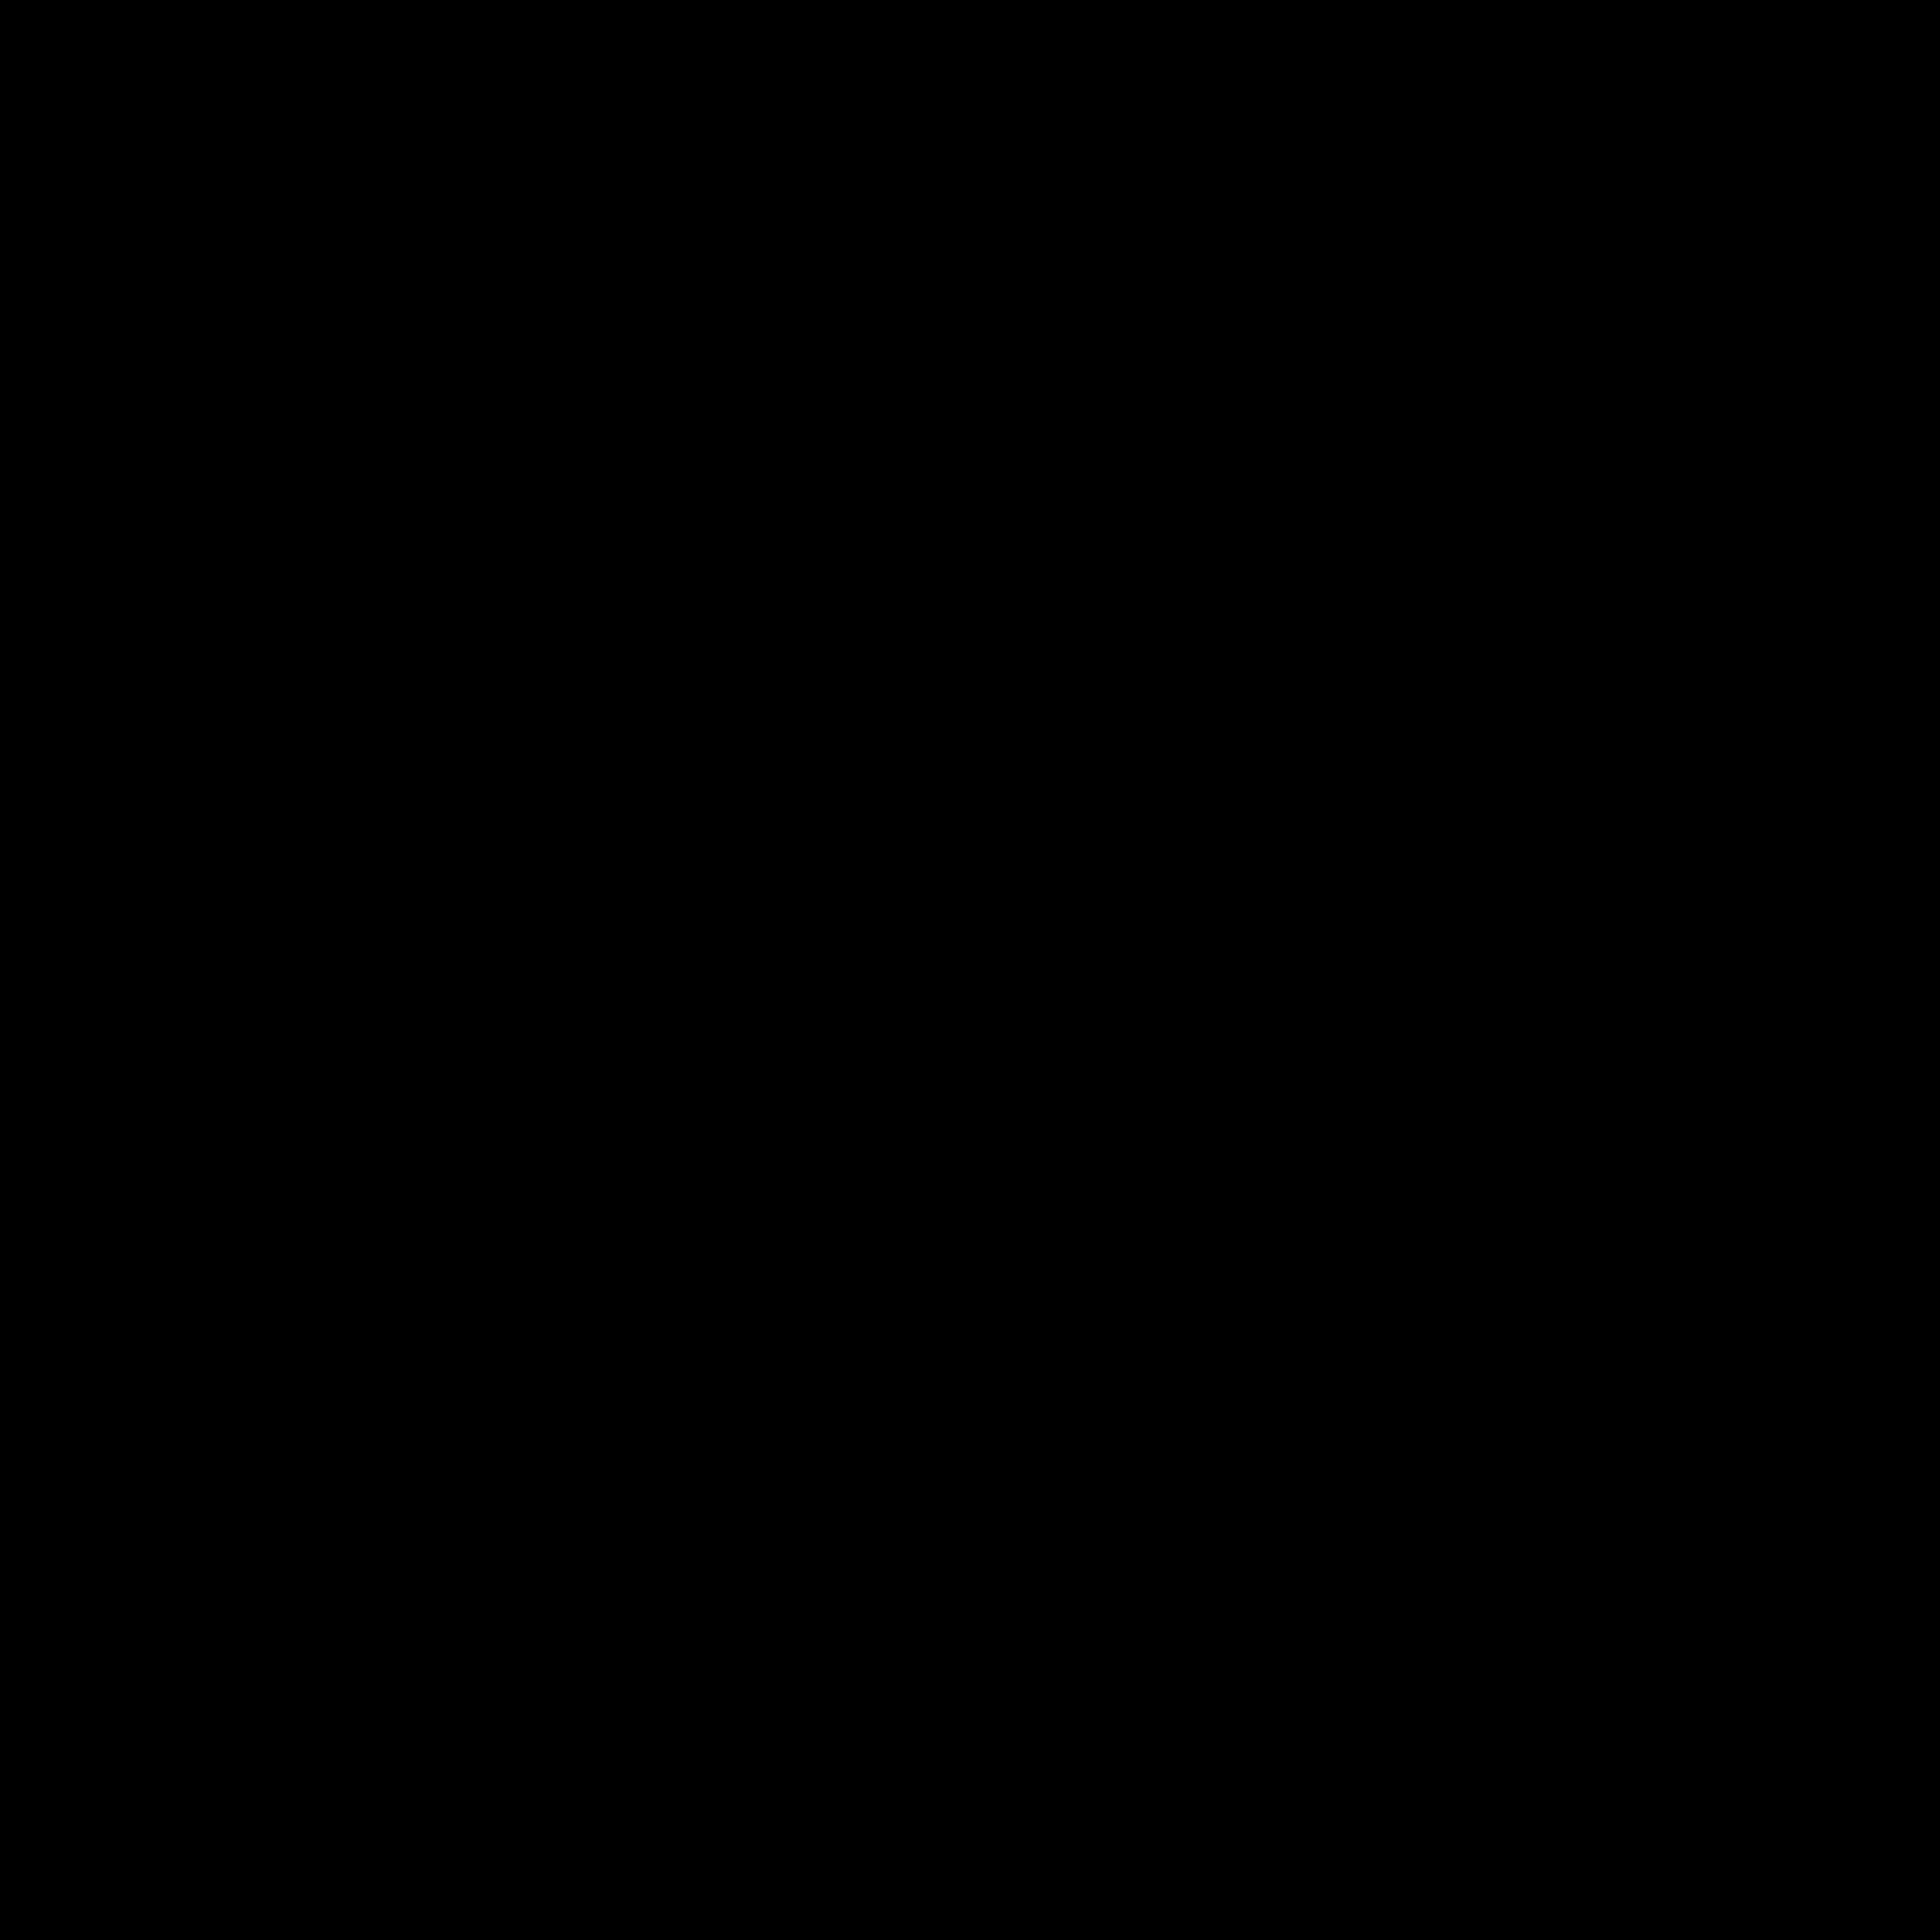 freeuse stock Ravenhead Glass Logo PNG Transparent